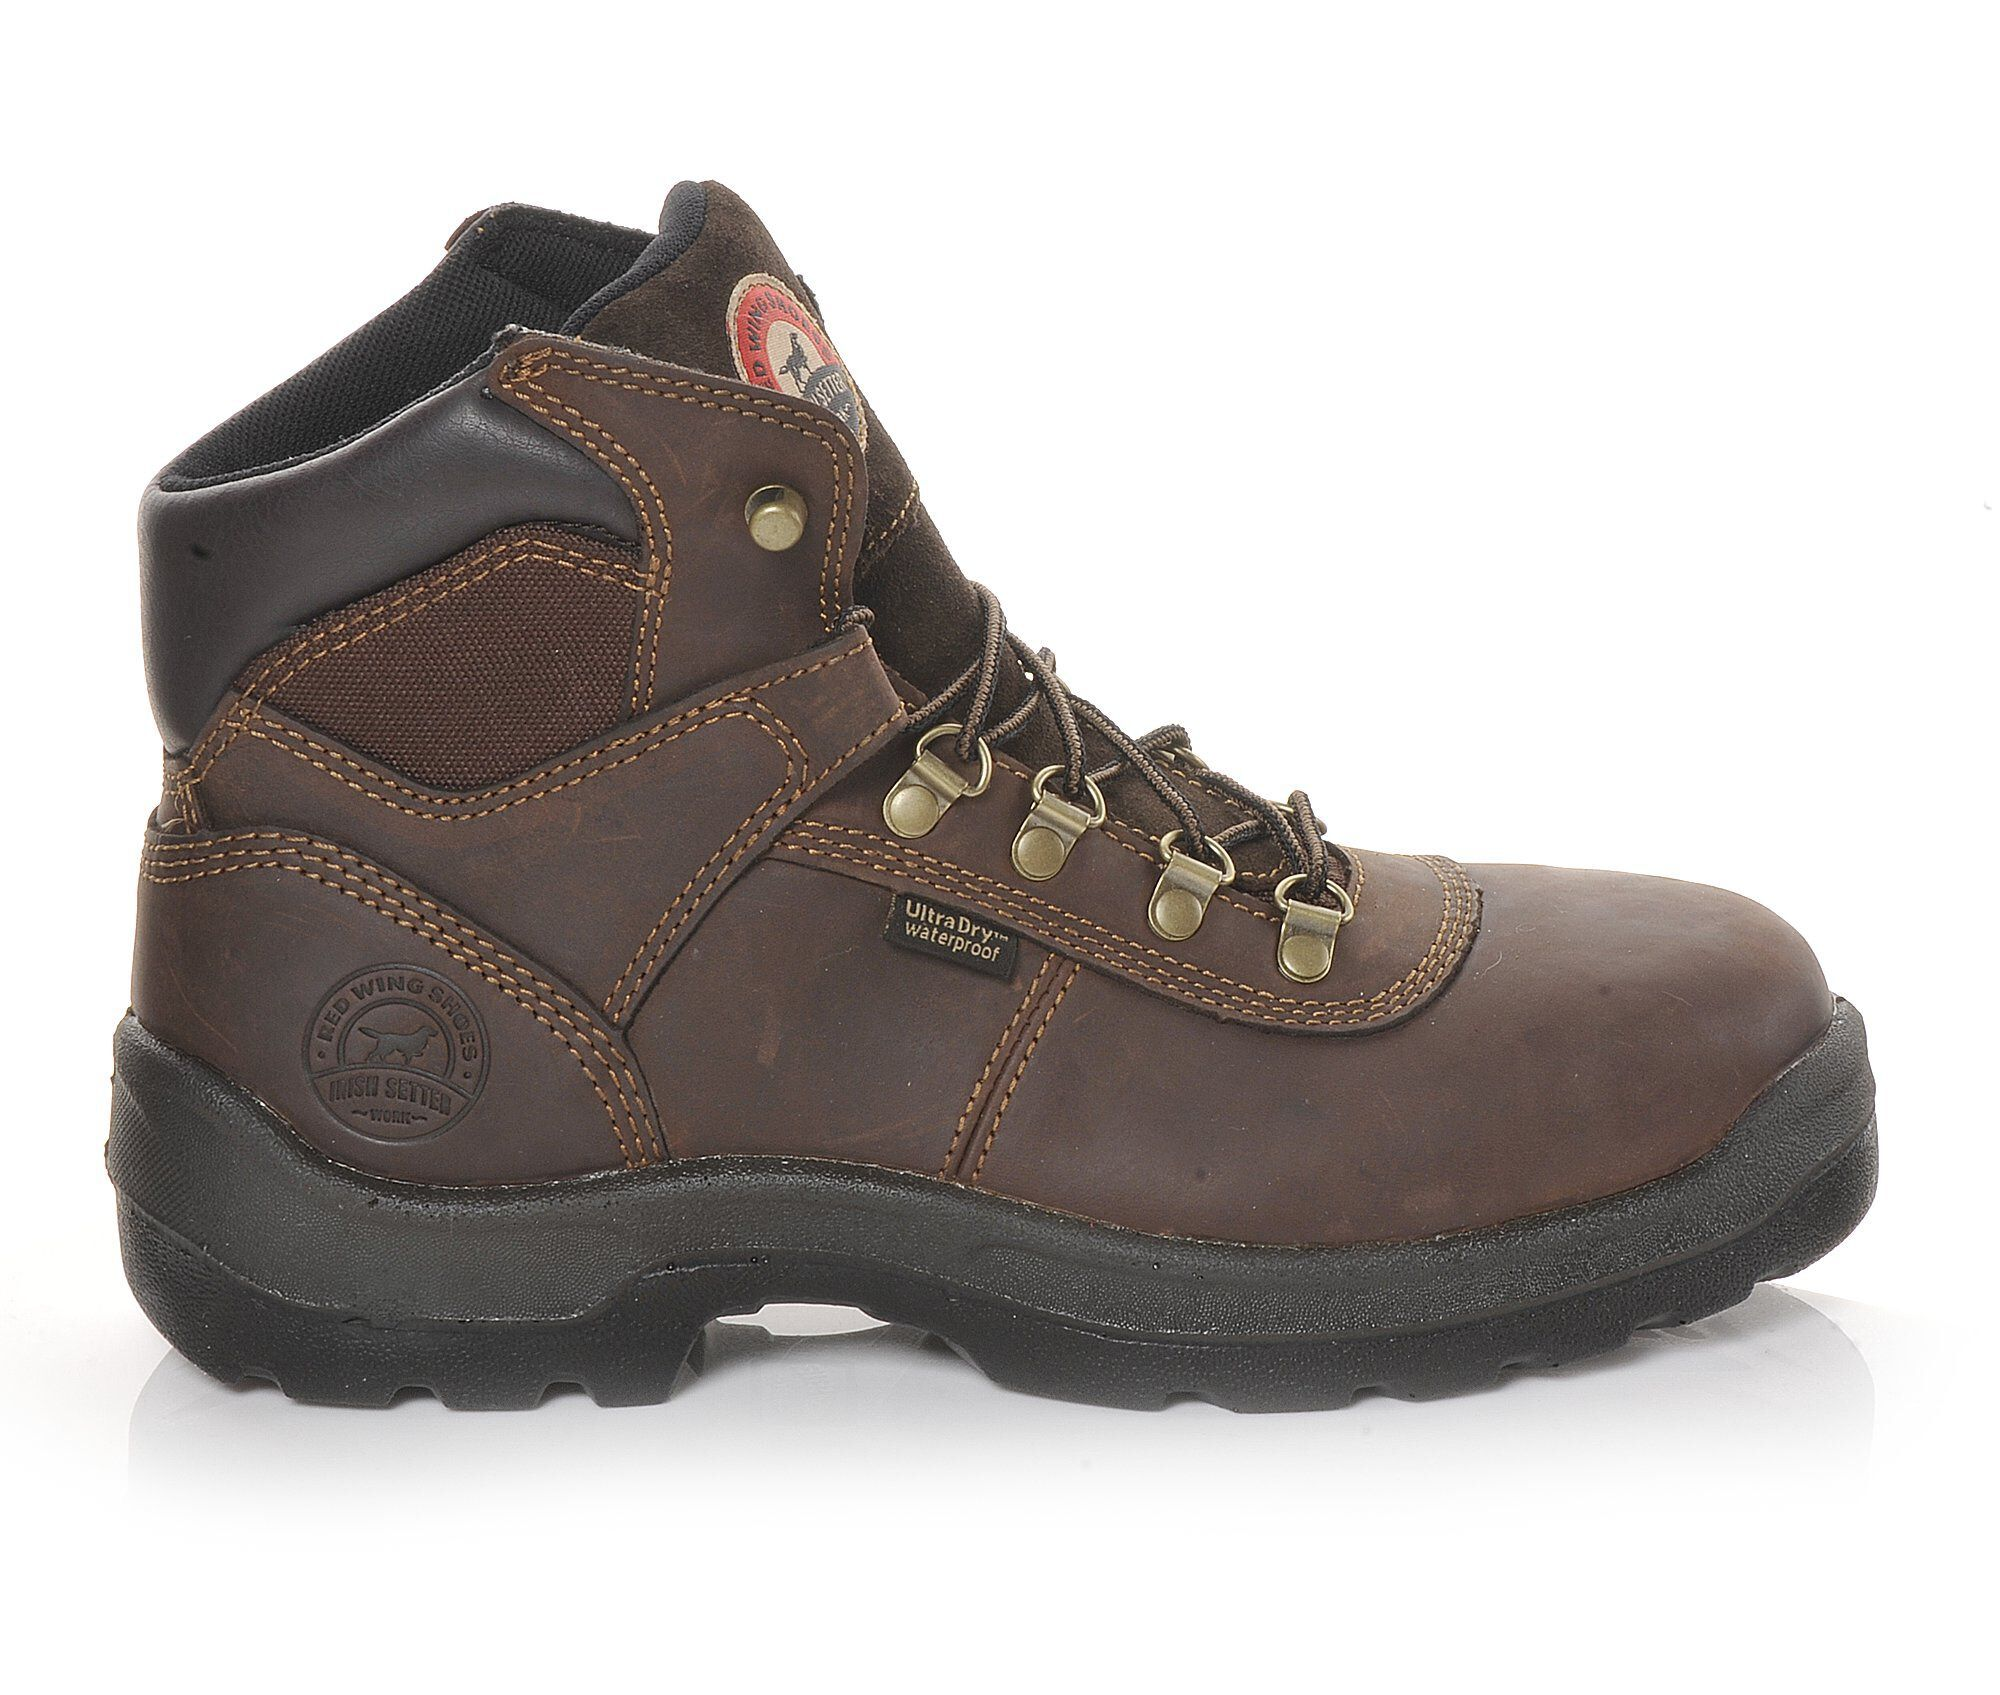 uk shoes_kd1421